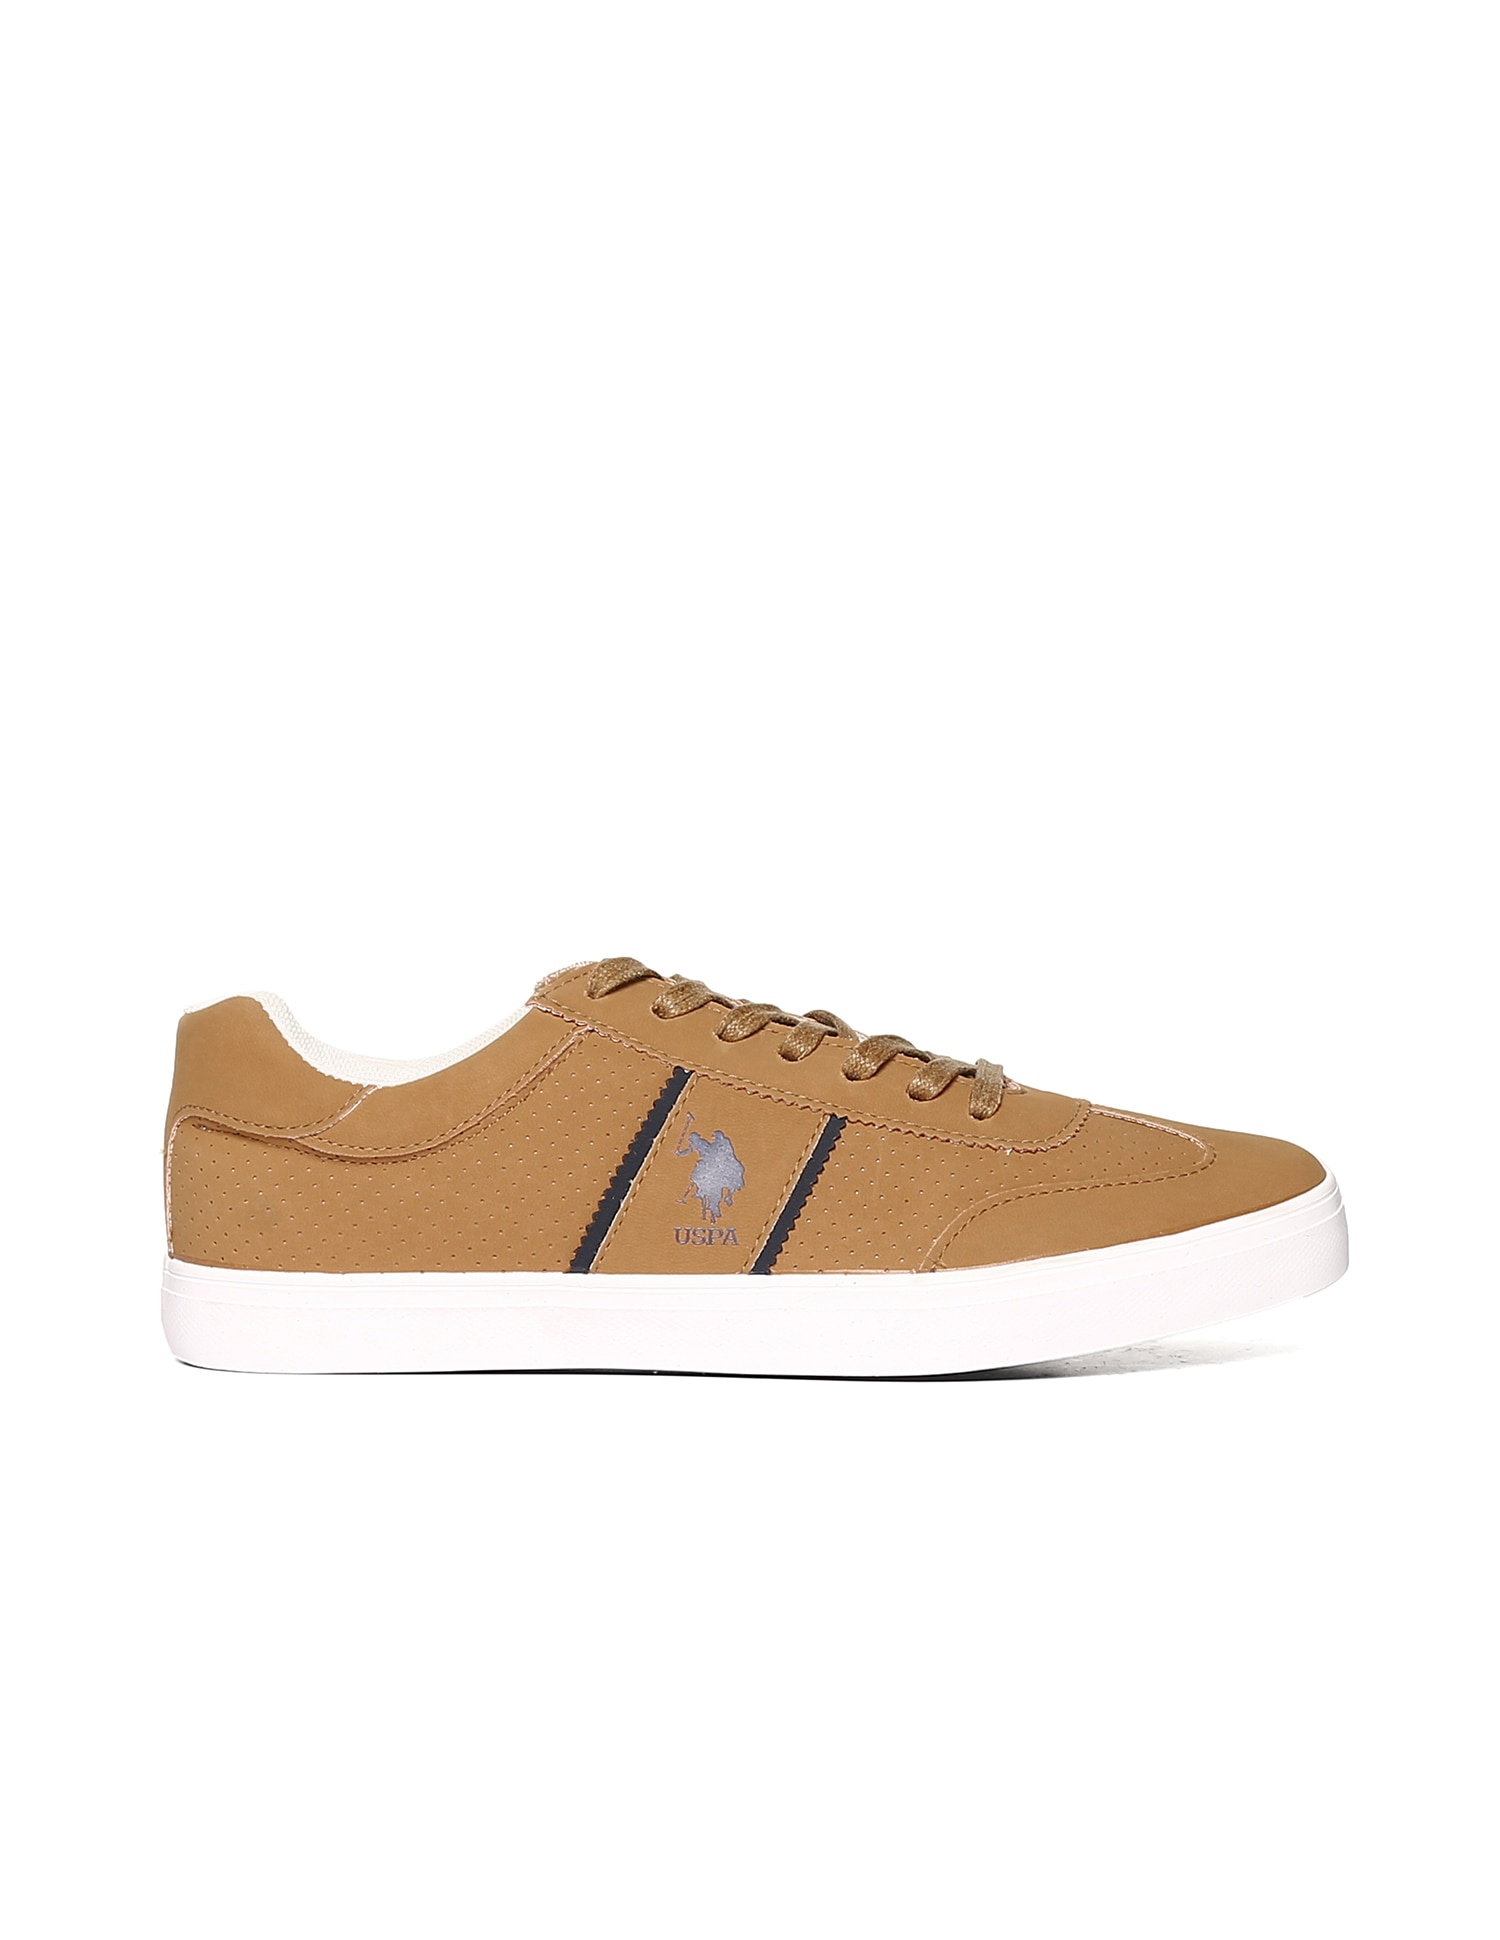 U.S. Polo Assn. Men Brown Sneakers - 5elow2ofriv